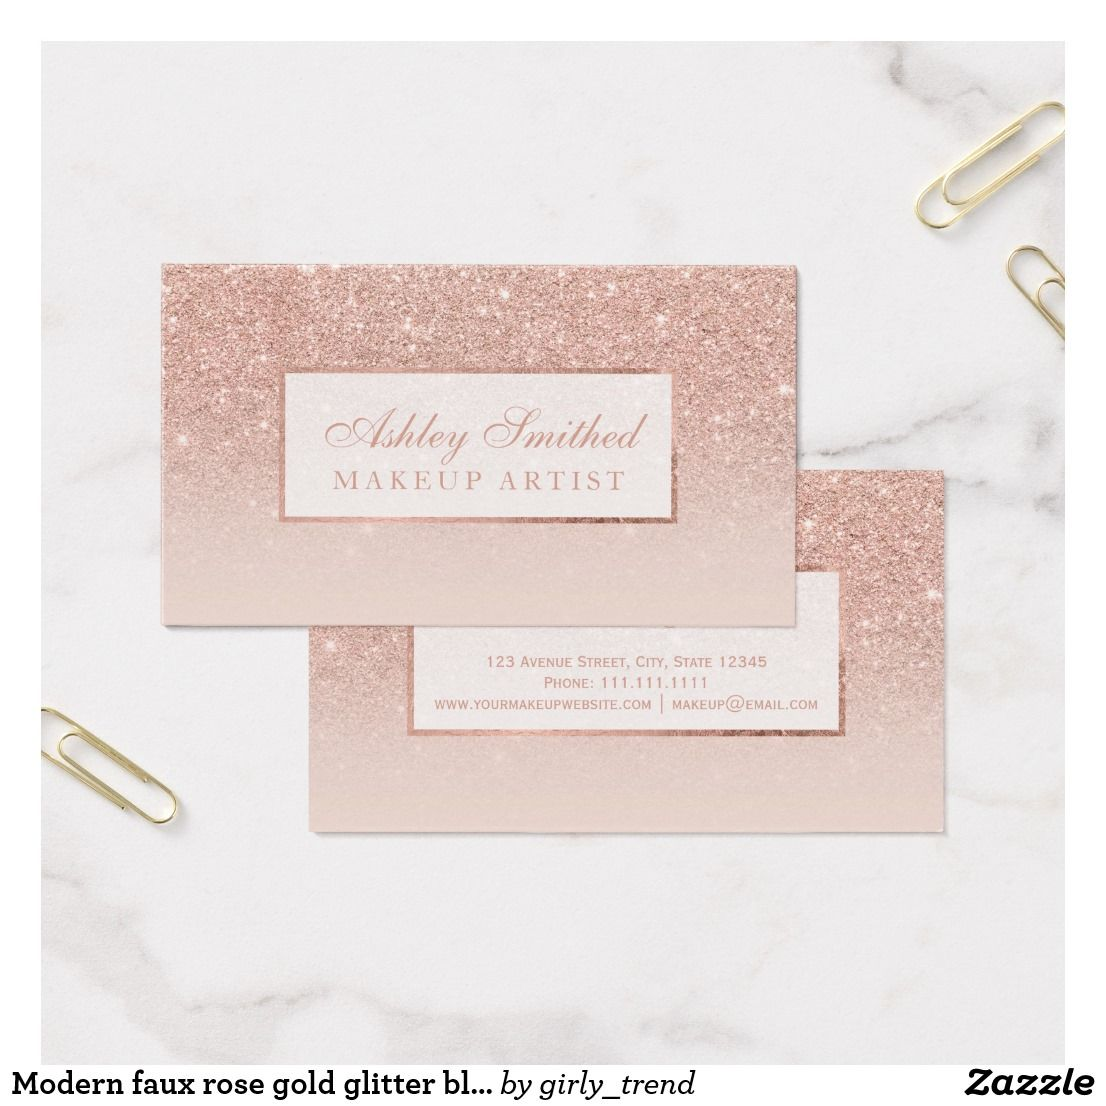 Modern faux rose gold glitter blush ombre makeup business card modern faux rose gold glitter blush ombre makeup business card reheart Image collections